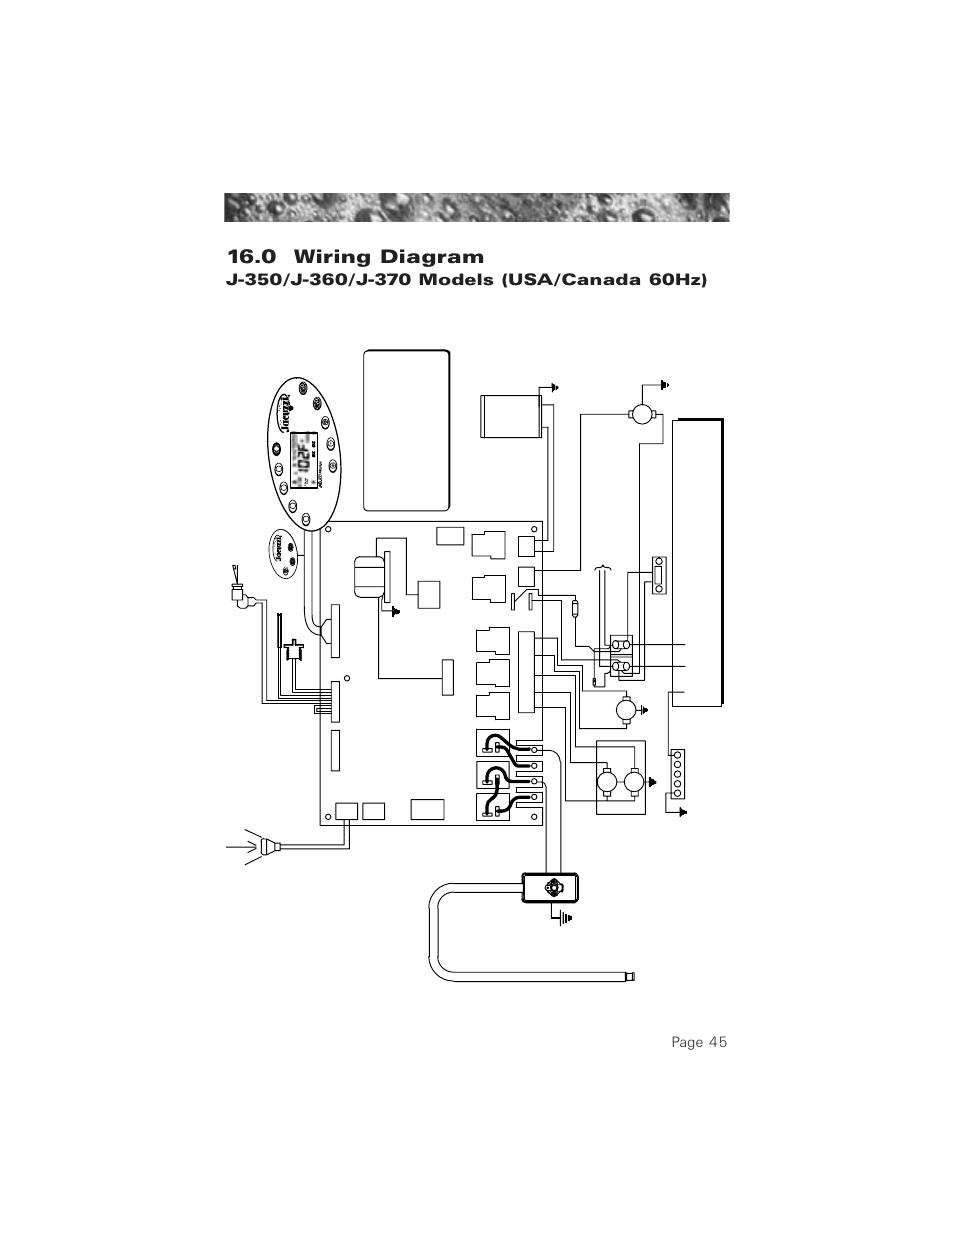 0 Wiring Diagram 60hz J 350 J 360 J 370 Models 0 Wiring